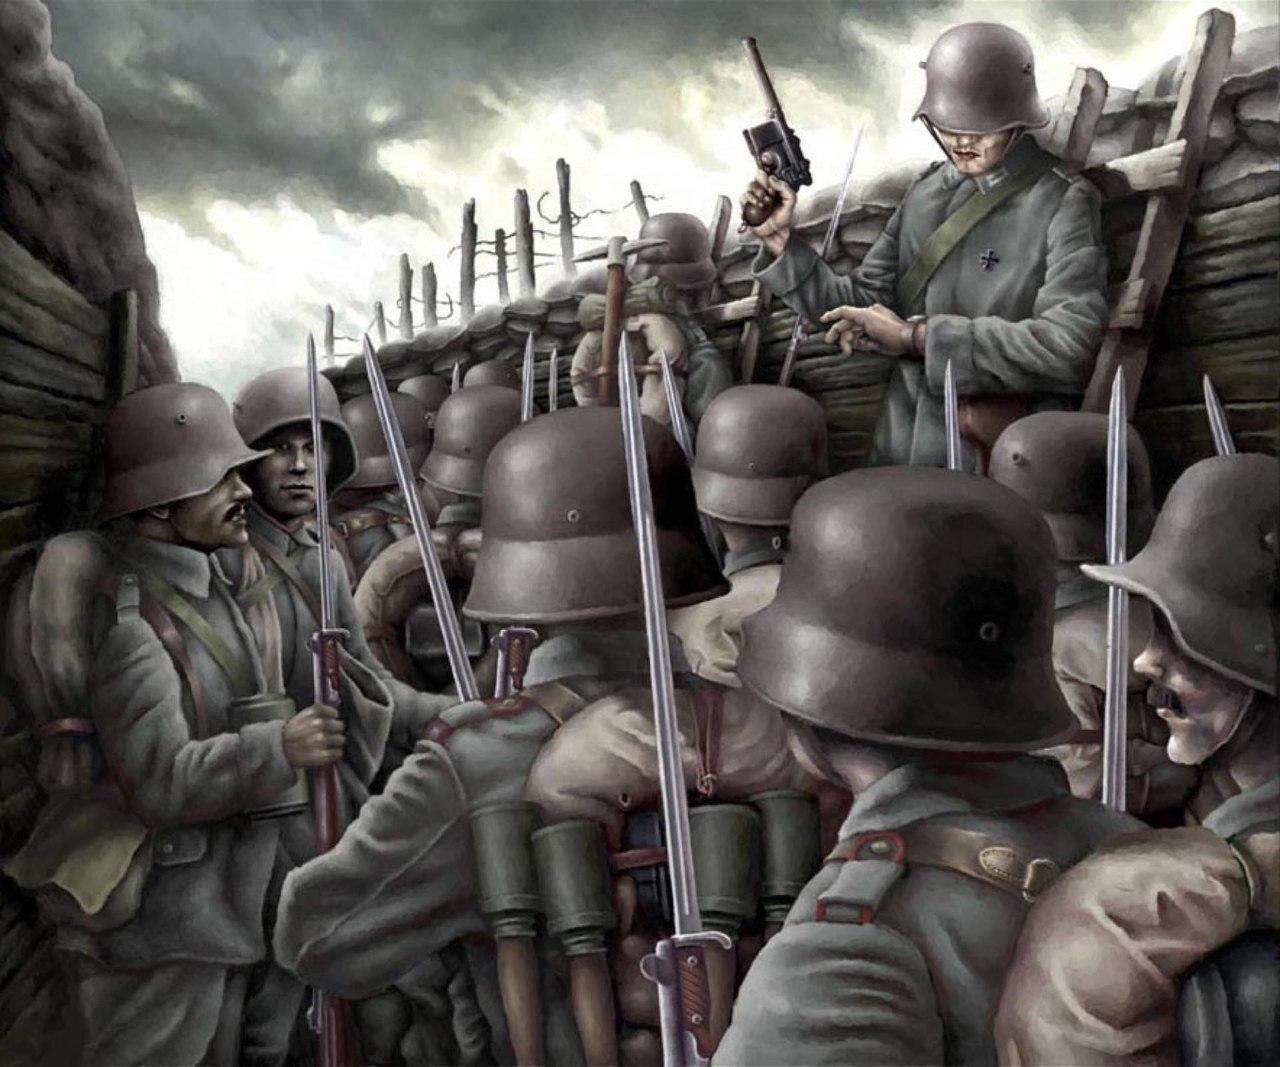 Немецкие солдаты в Битве при Вердене, 1916 год. Art by Lukasz Mieszkowski.